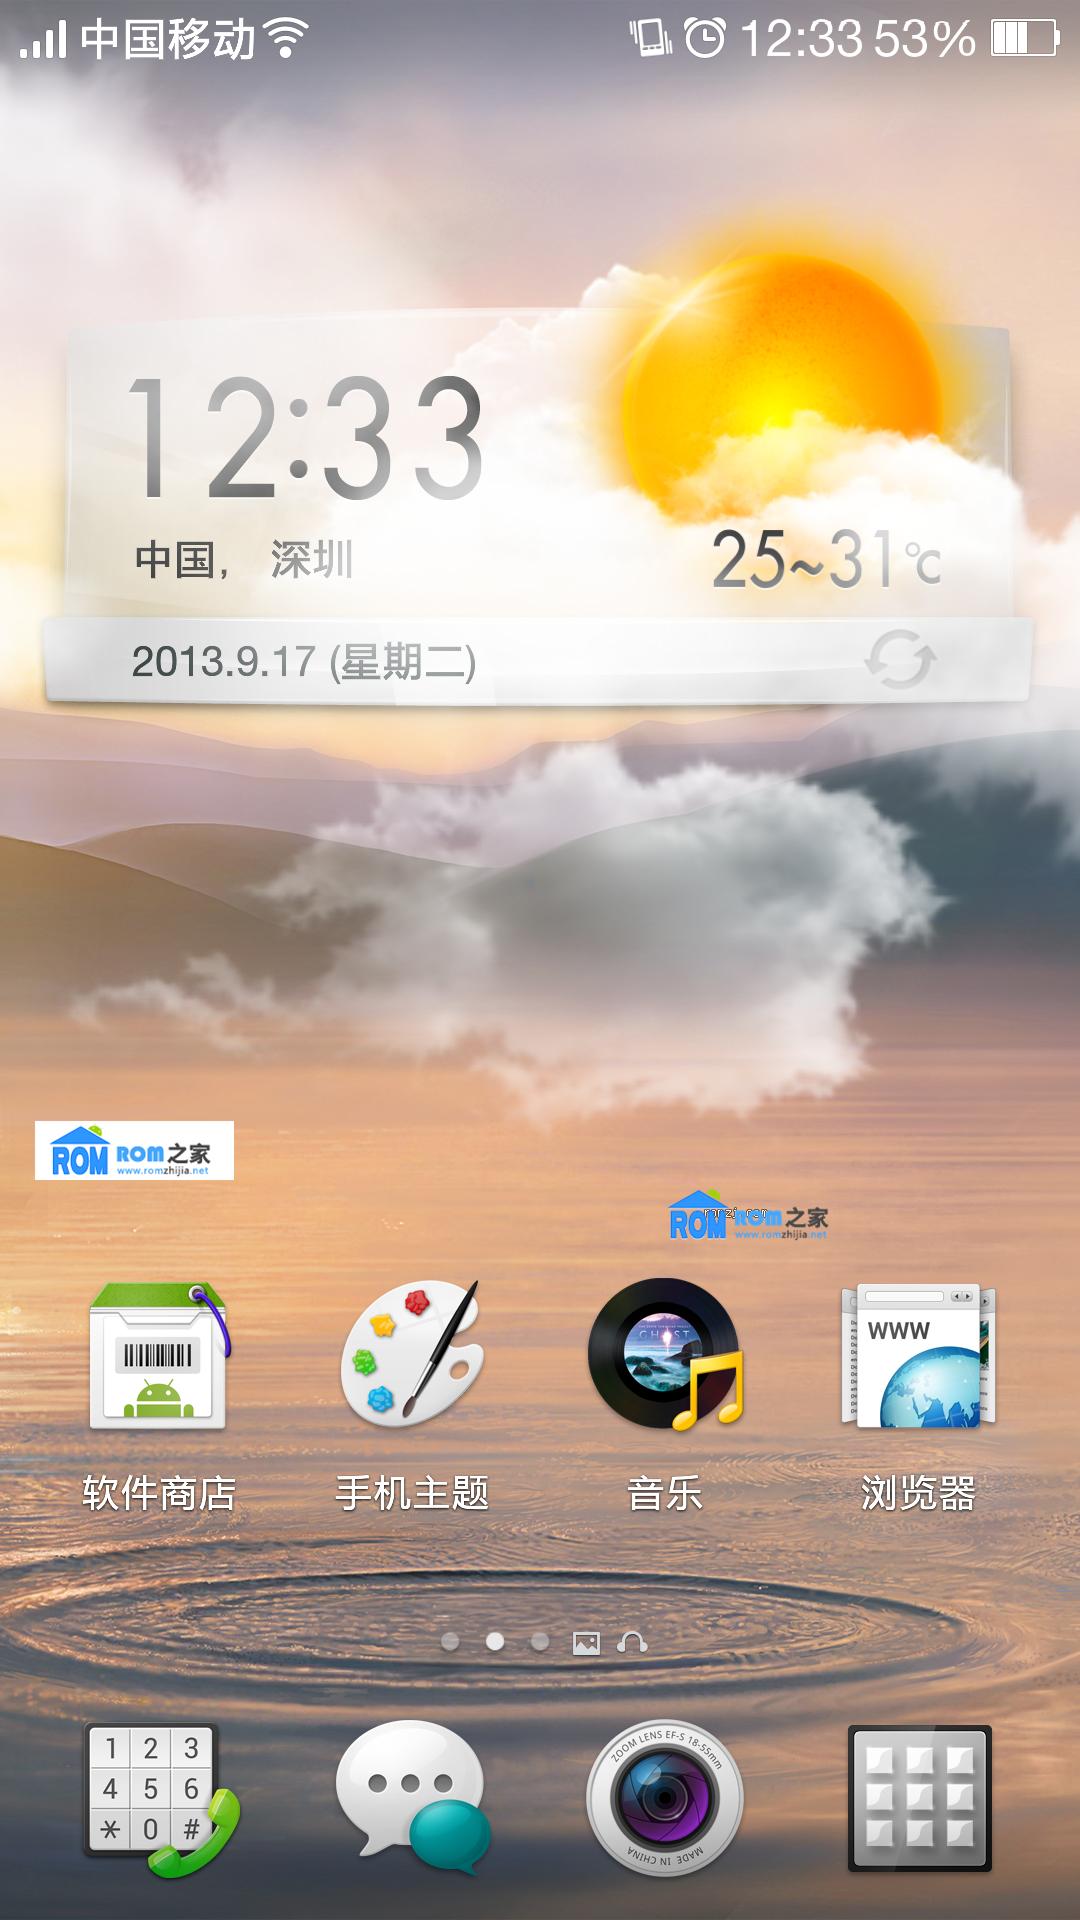 OPPO Find 5 移动版 (X909T) 刷机包 全新Color OS!华丽转身 完美蜕变!截图